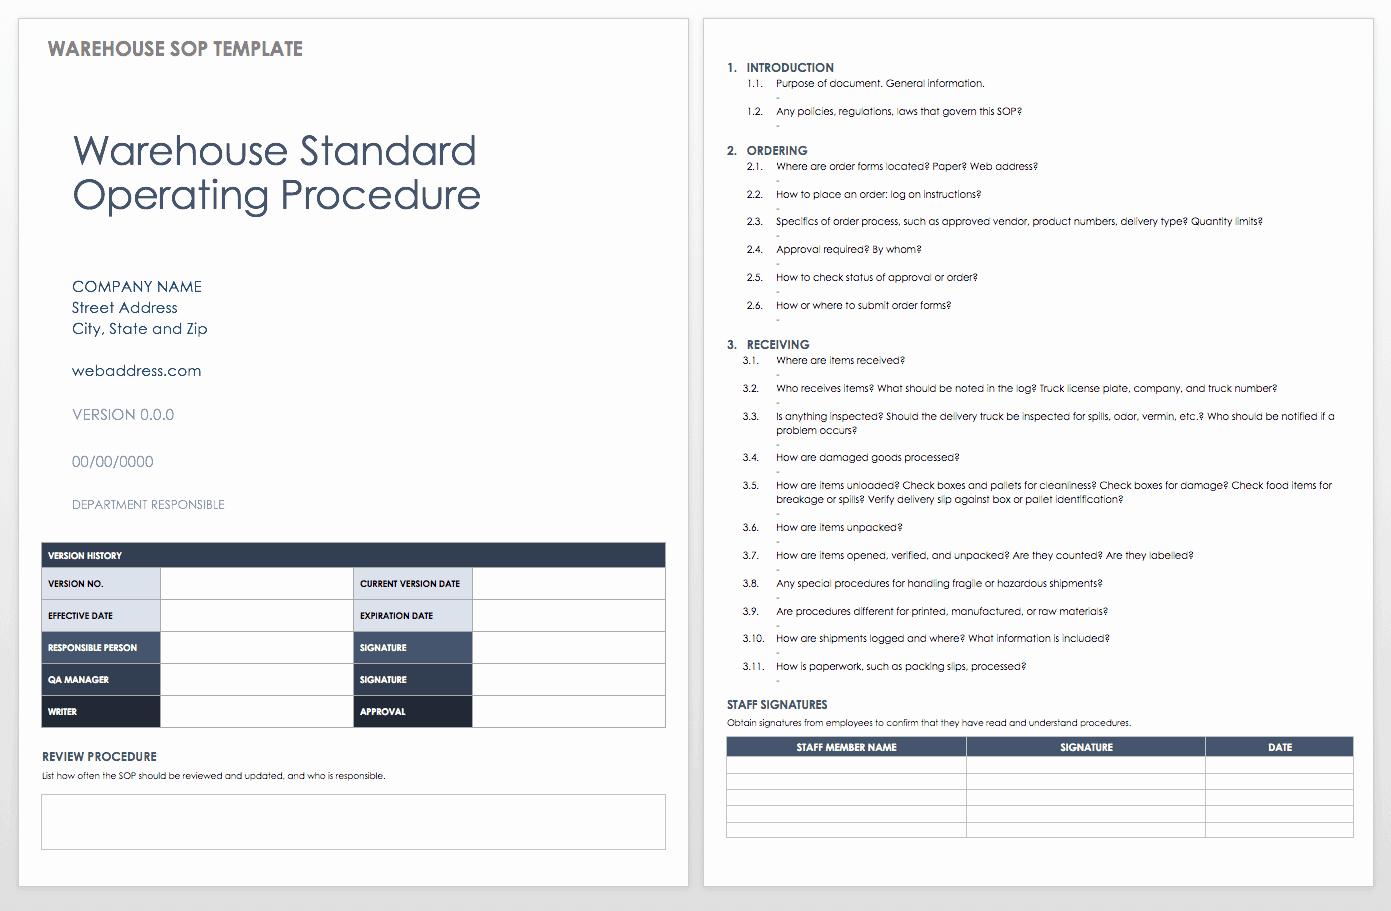 Standard Operating Procedure Template Word Lovely Standard Operating Procedures Templates